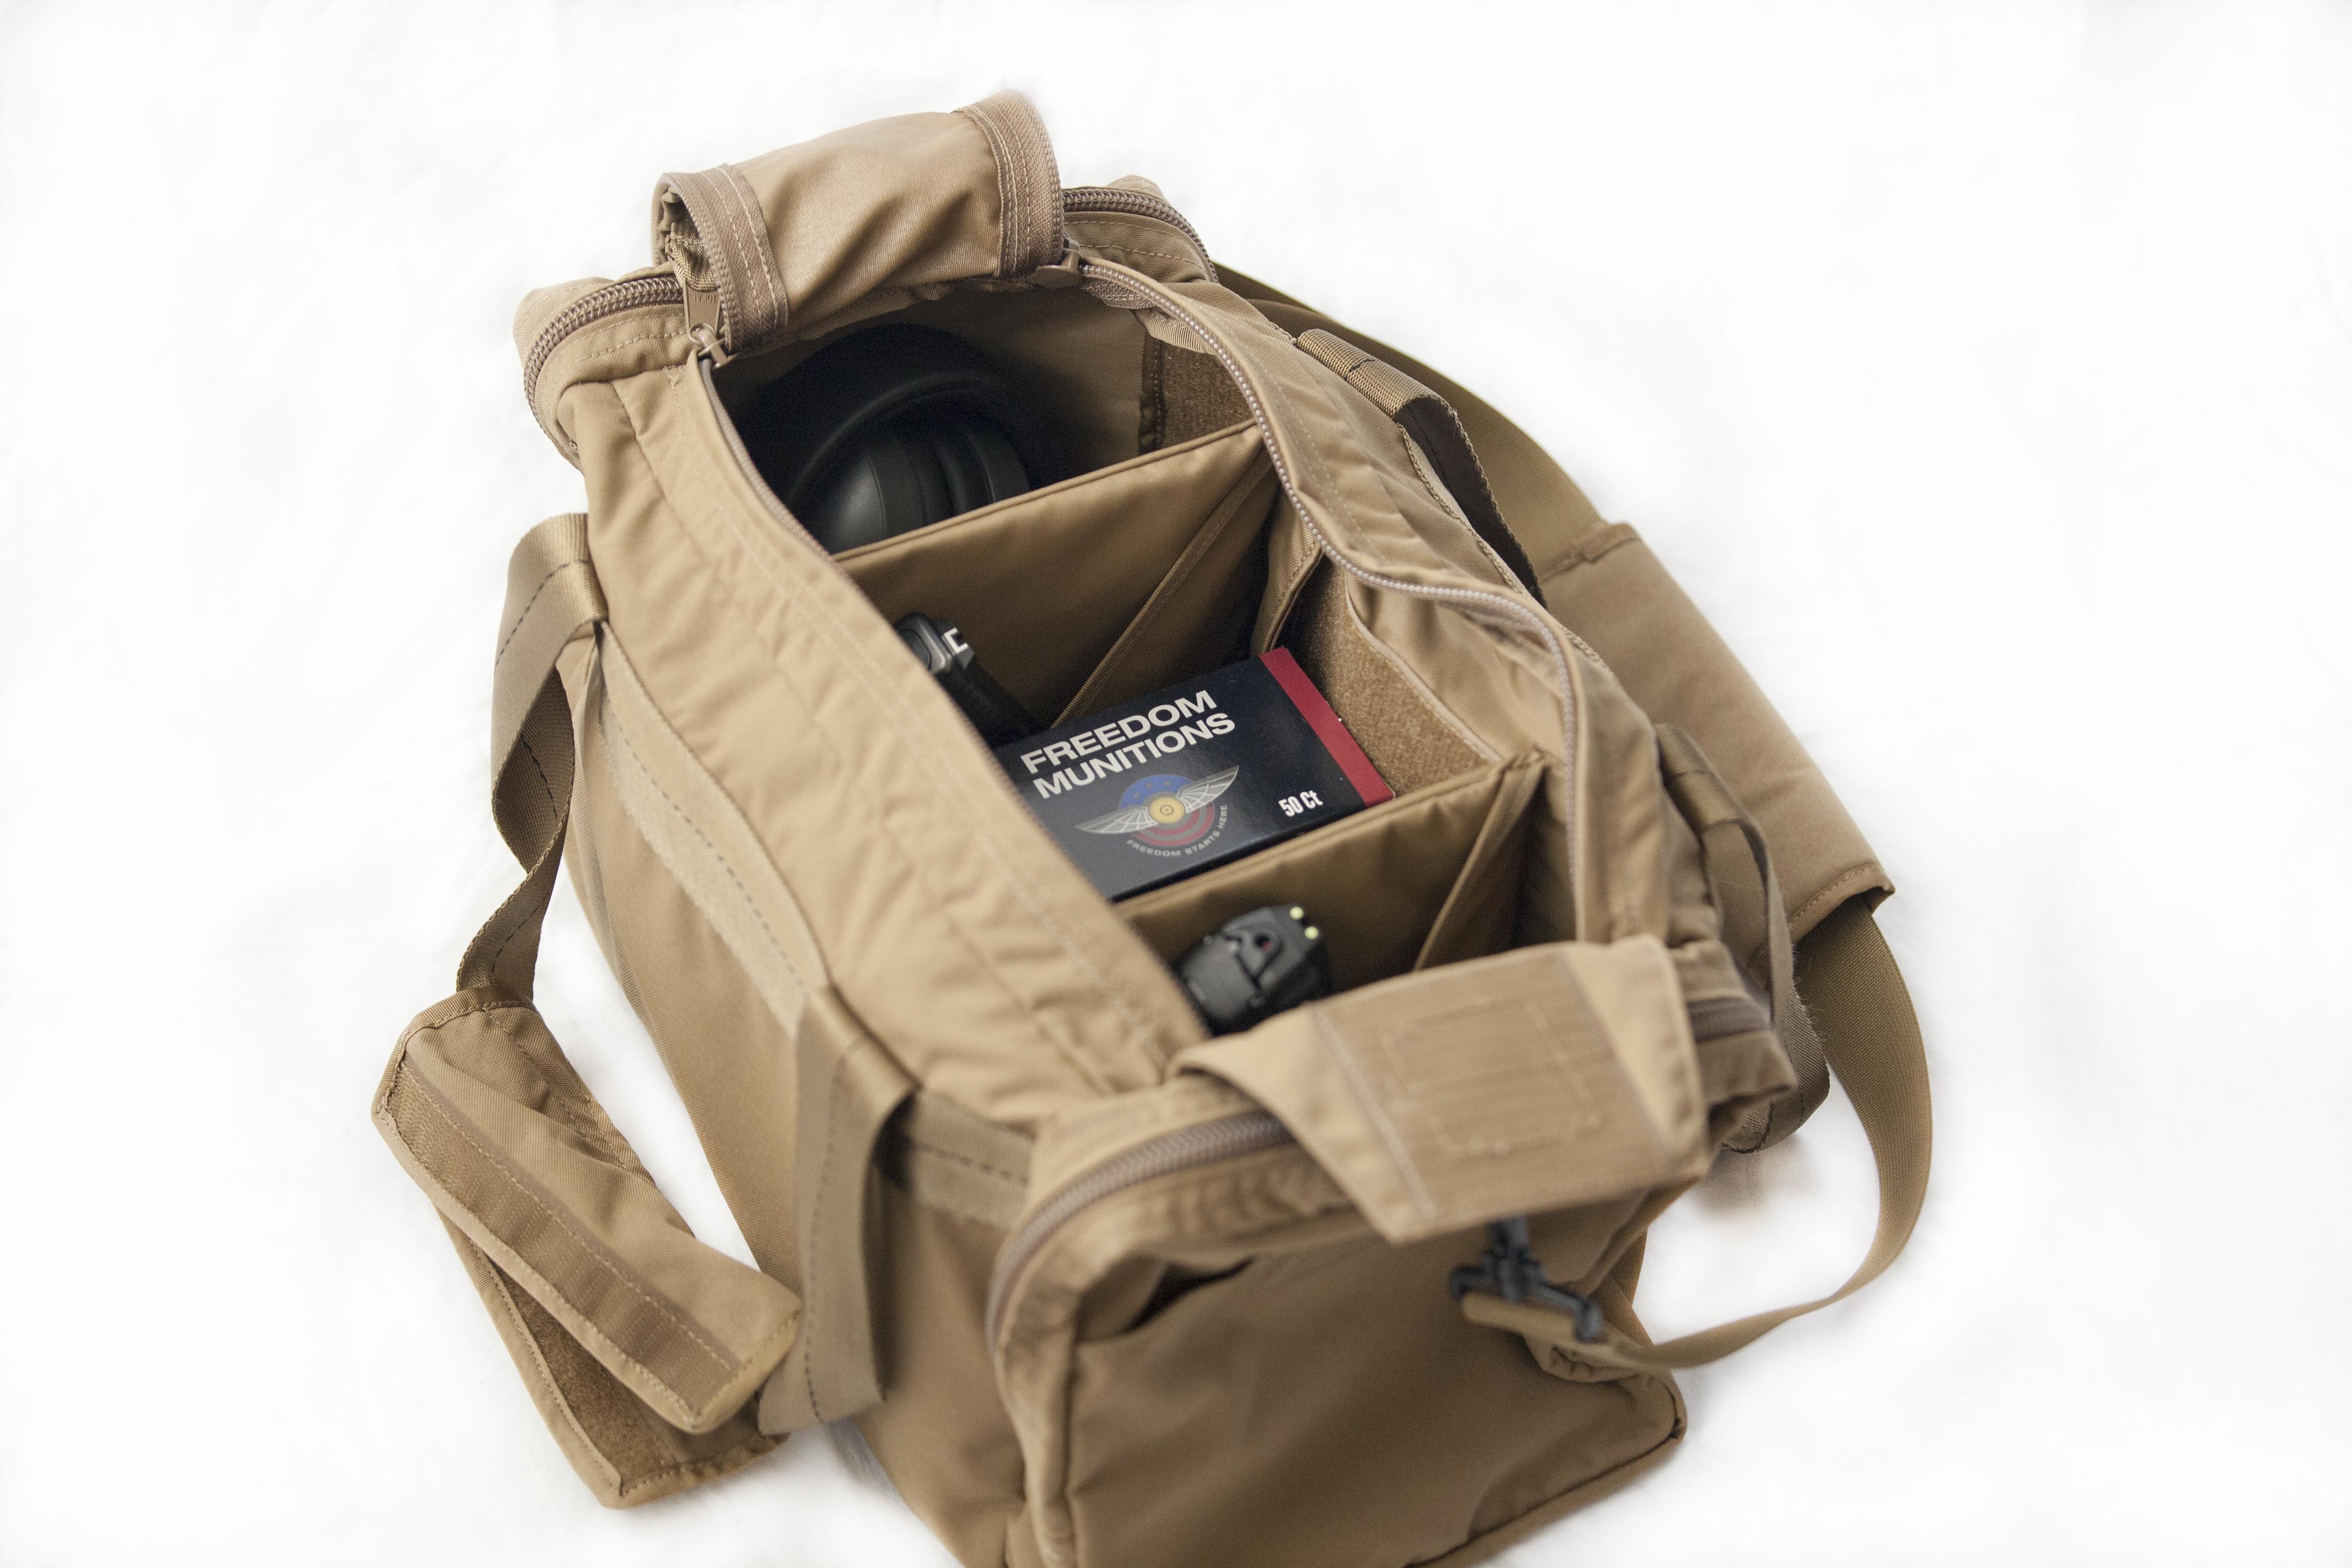 Tan (FDE) Pistol Bag Interior